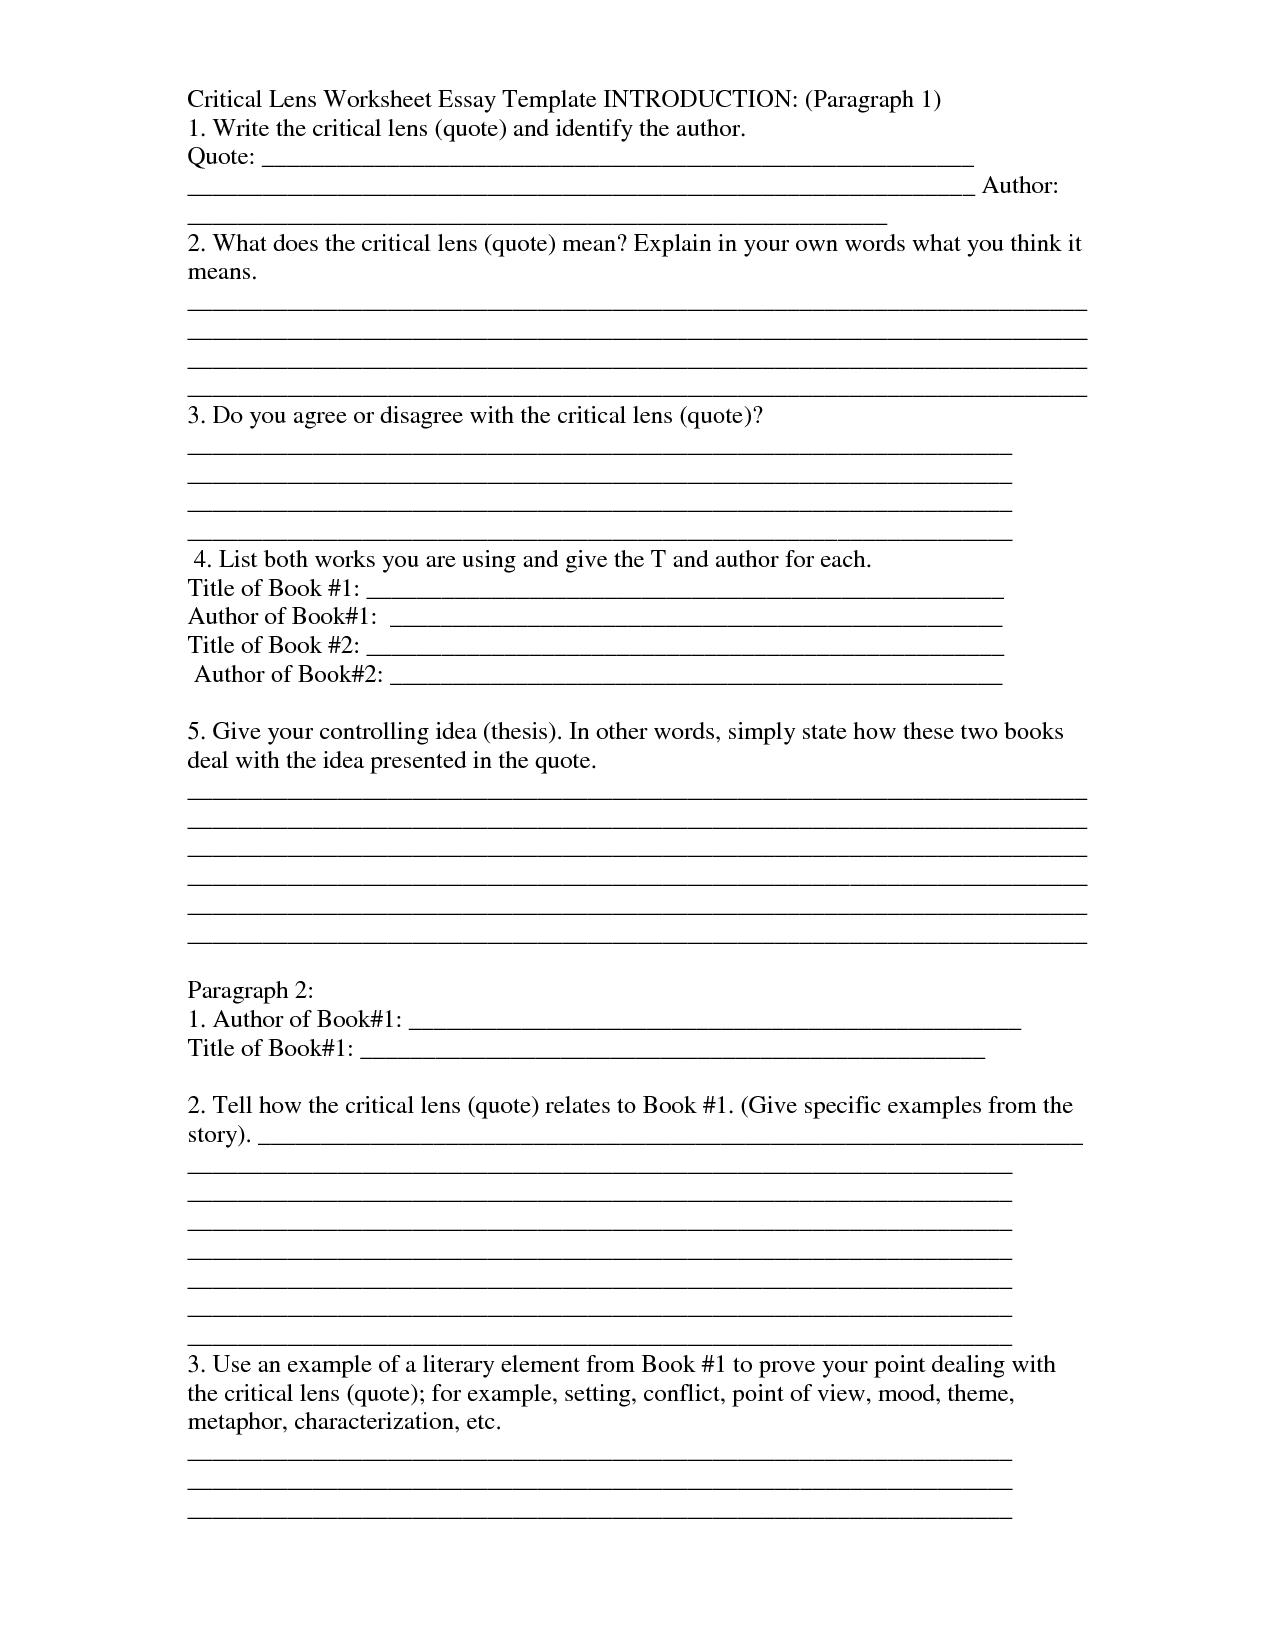 Writing An Essay Introduction Worksheet Essays Hub